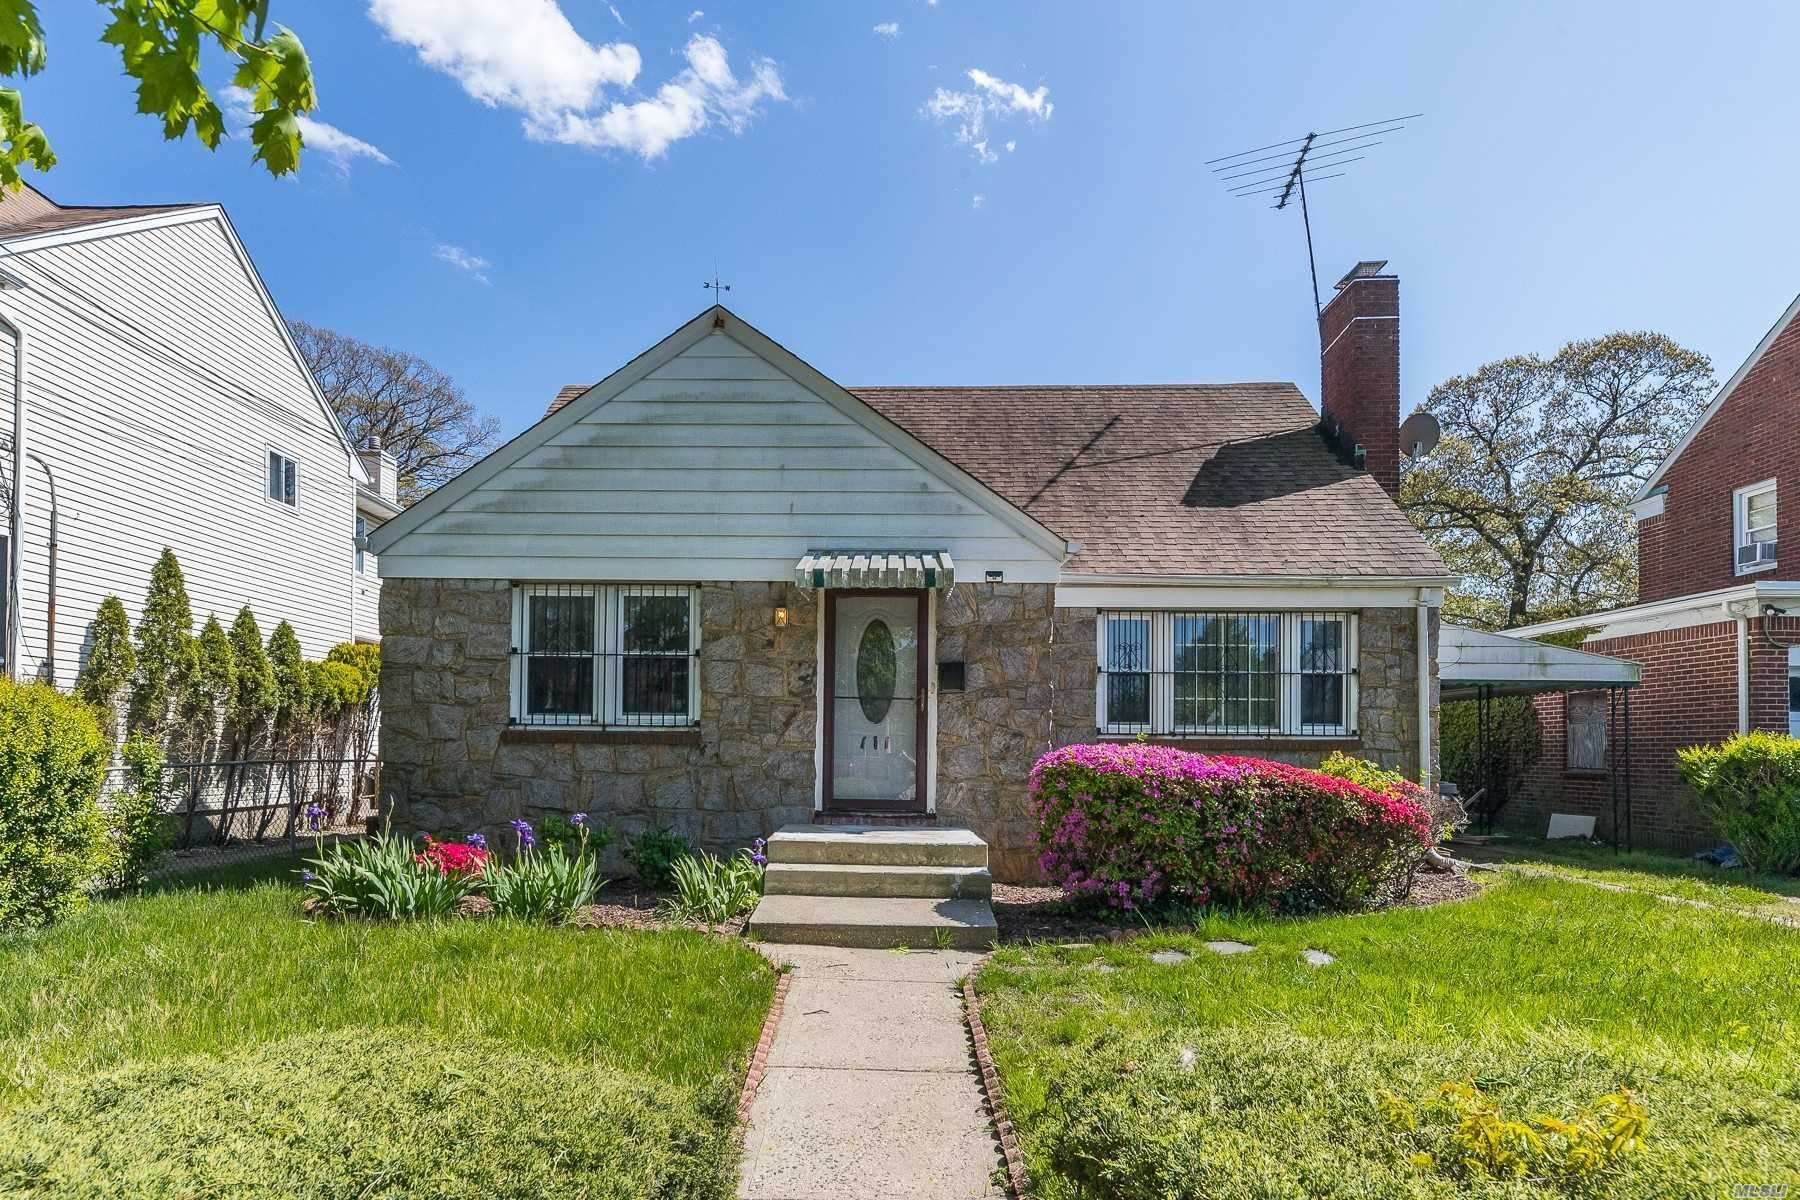 171 Hudson Avenue, Roosevelt, NY 11575 - MLS#: 3215445